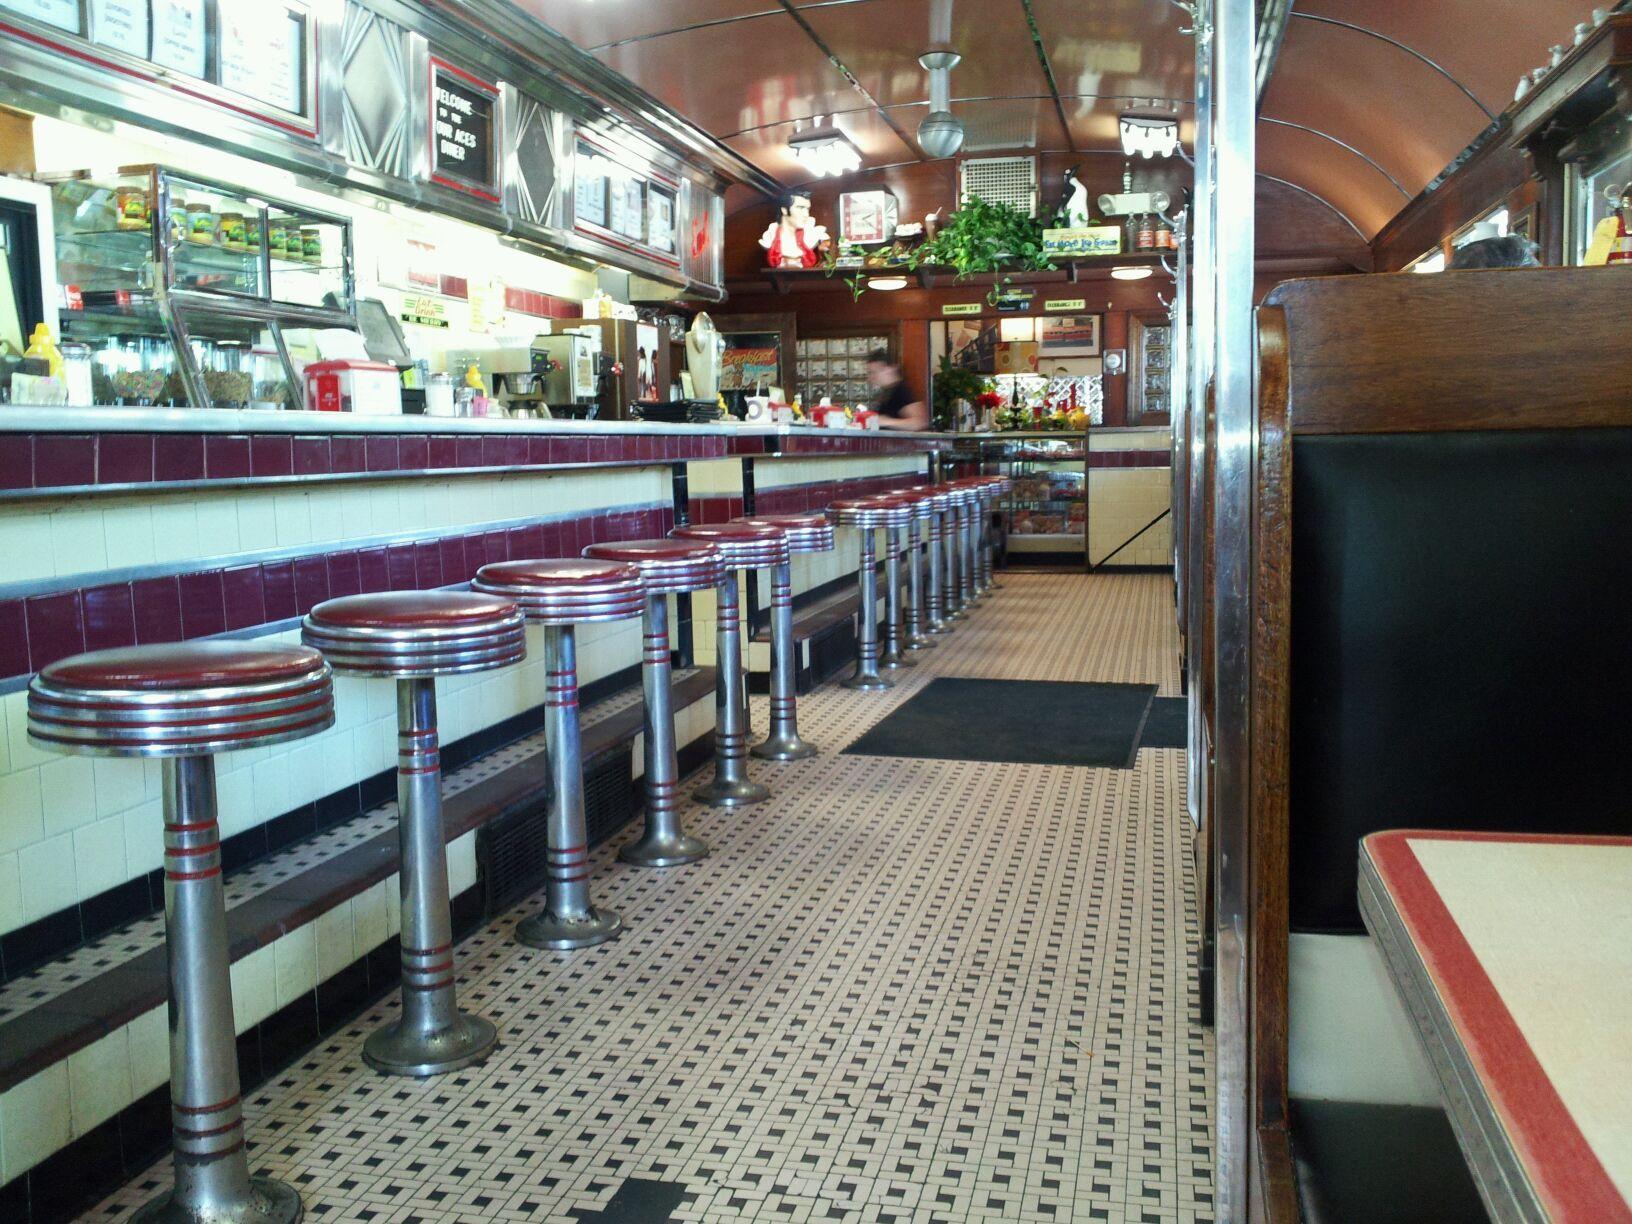 Authentic fifties decor and diner restaurant recherche